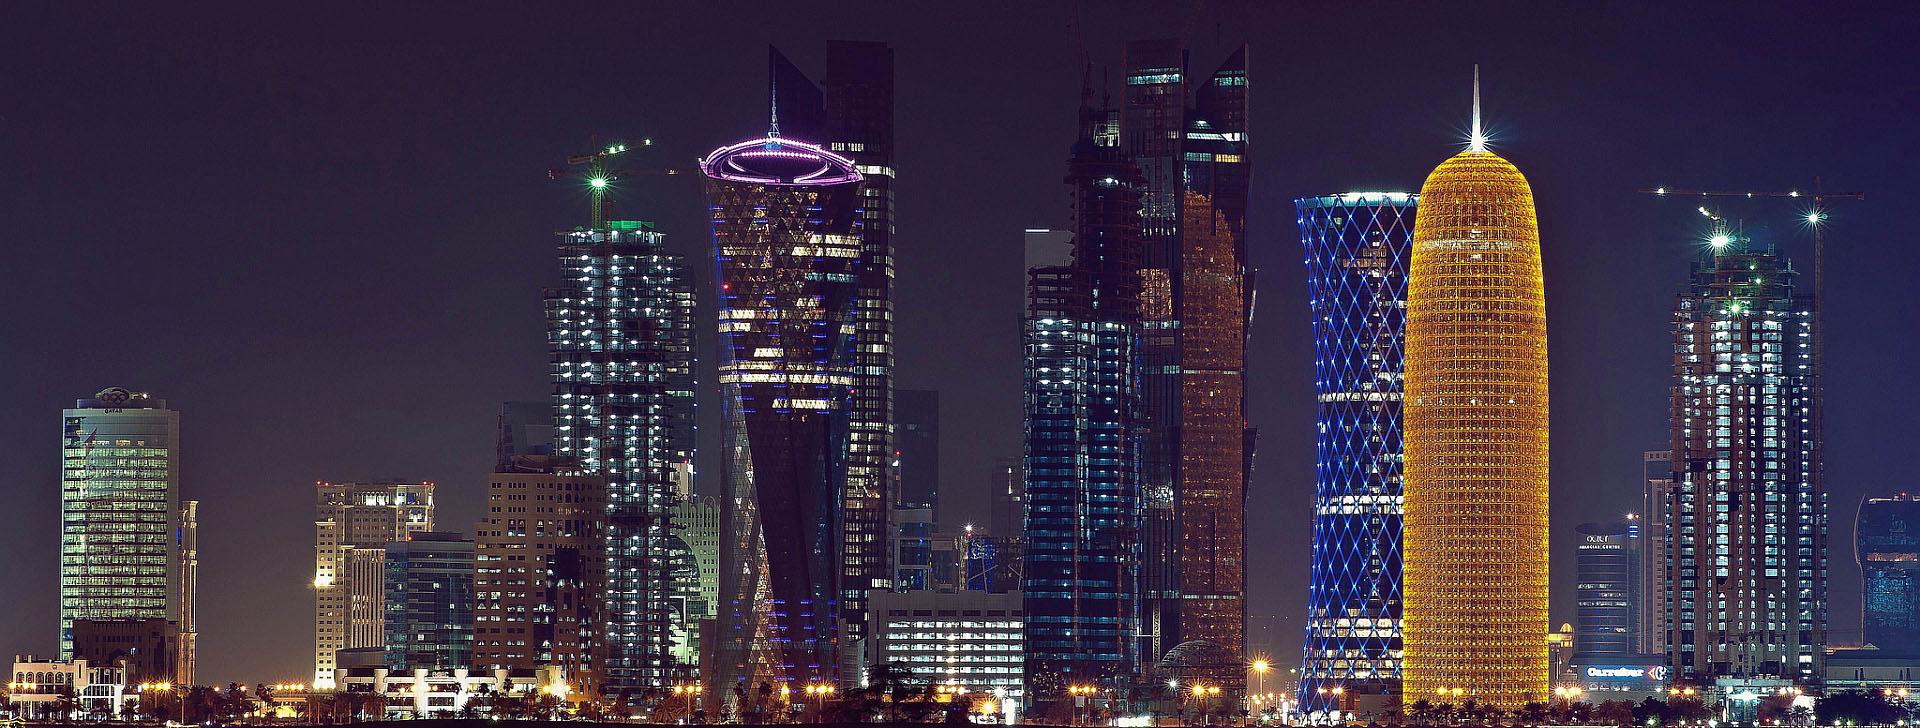 Doha, Qatar, sede de la Final Internacional de Global Management Challenge 2017